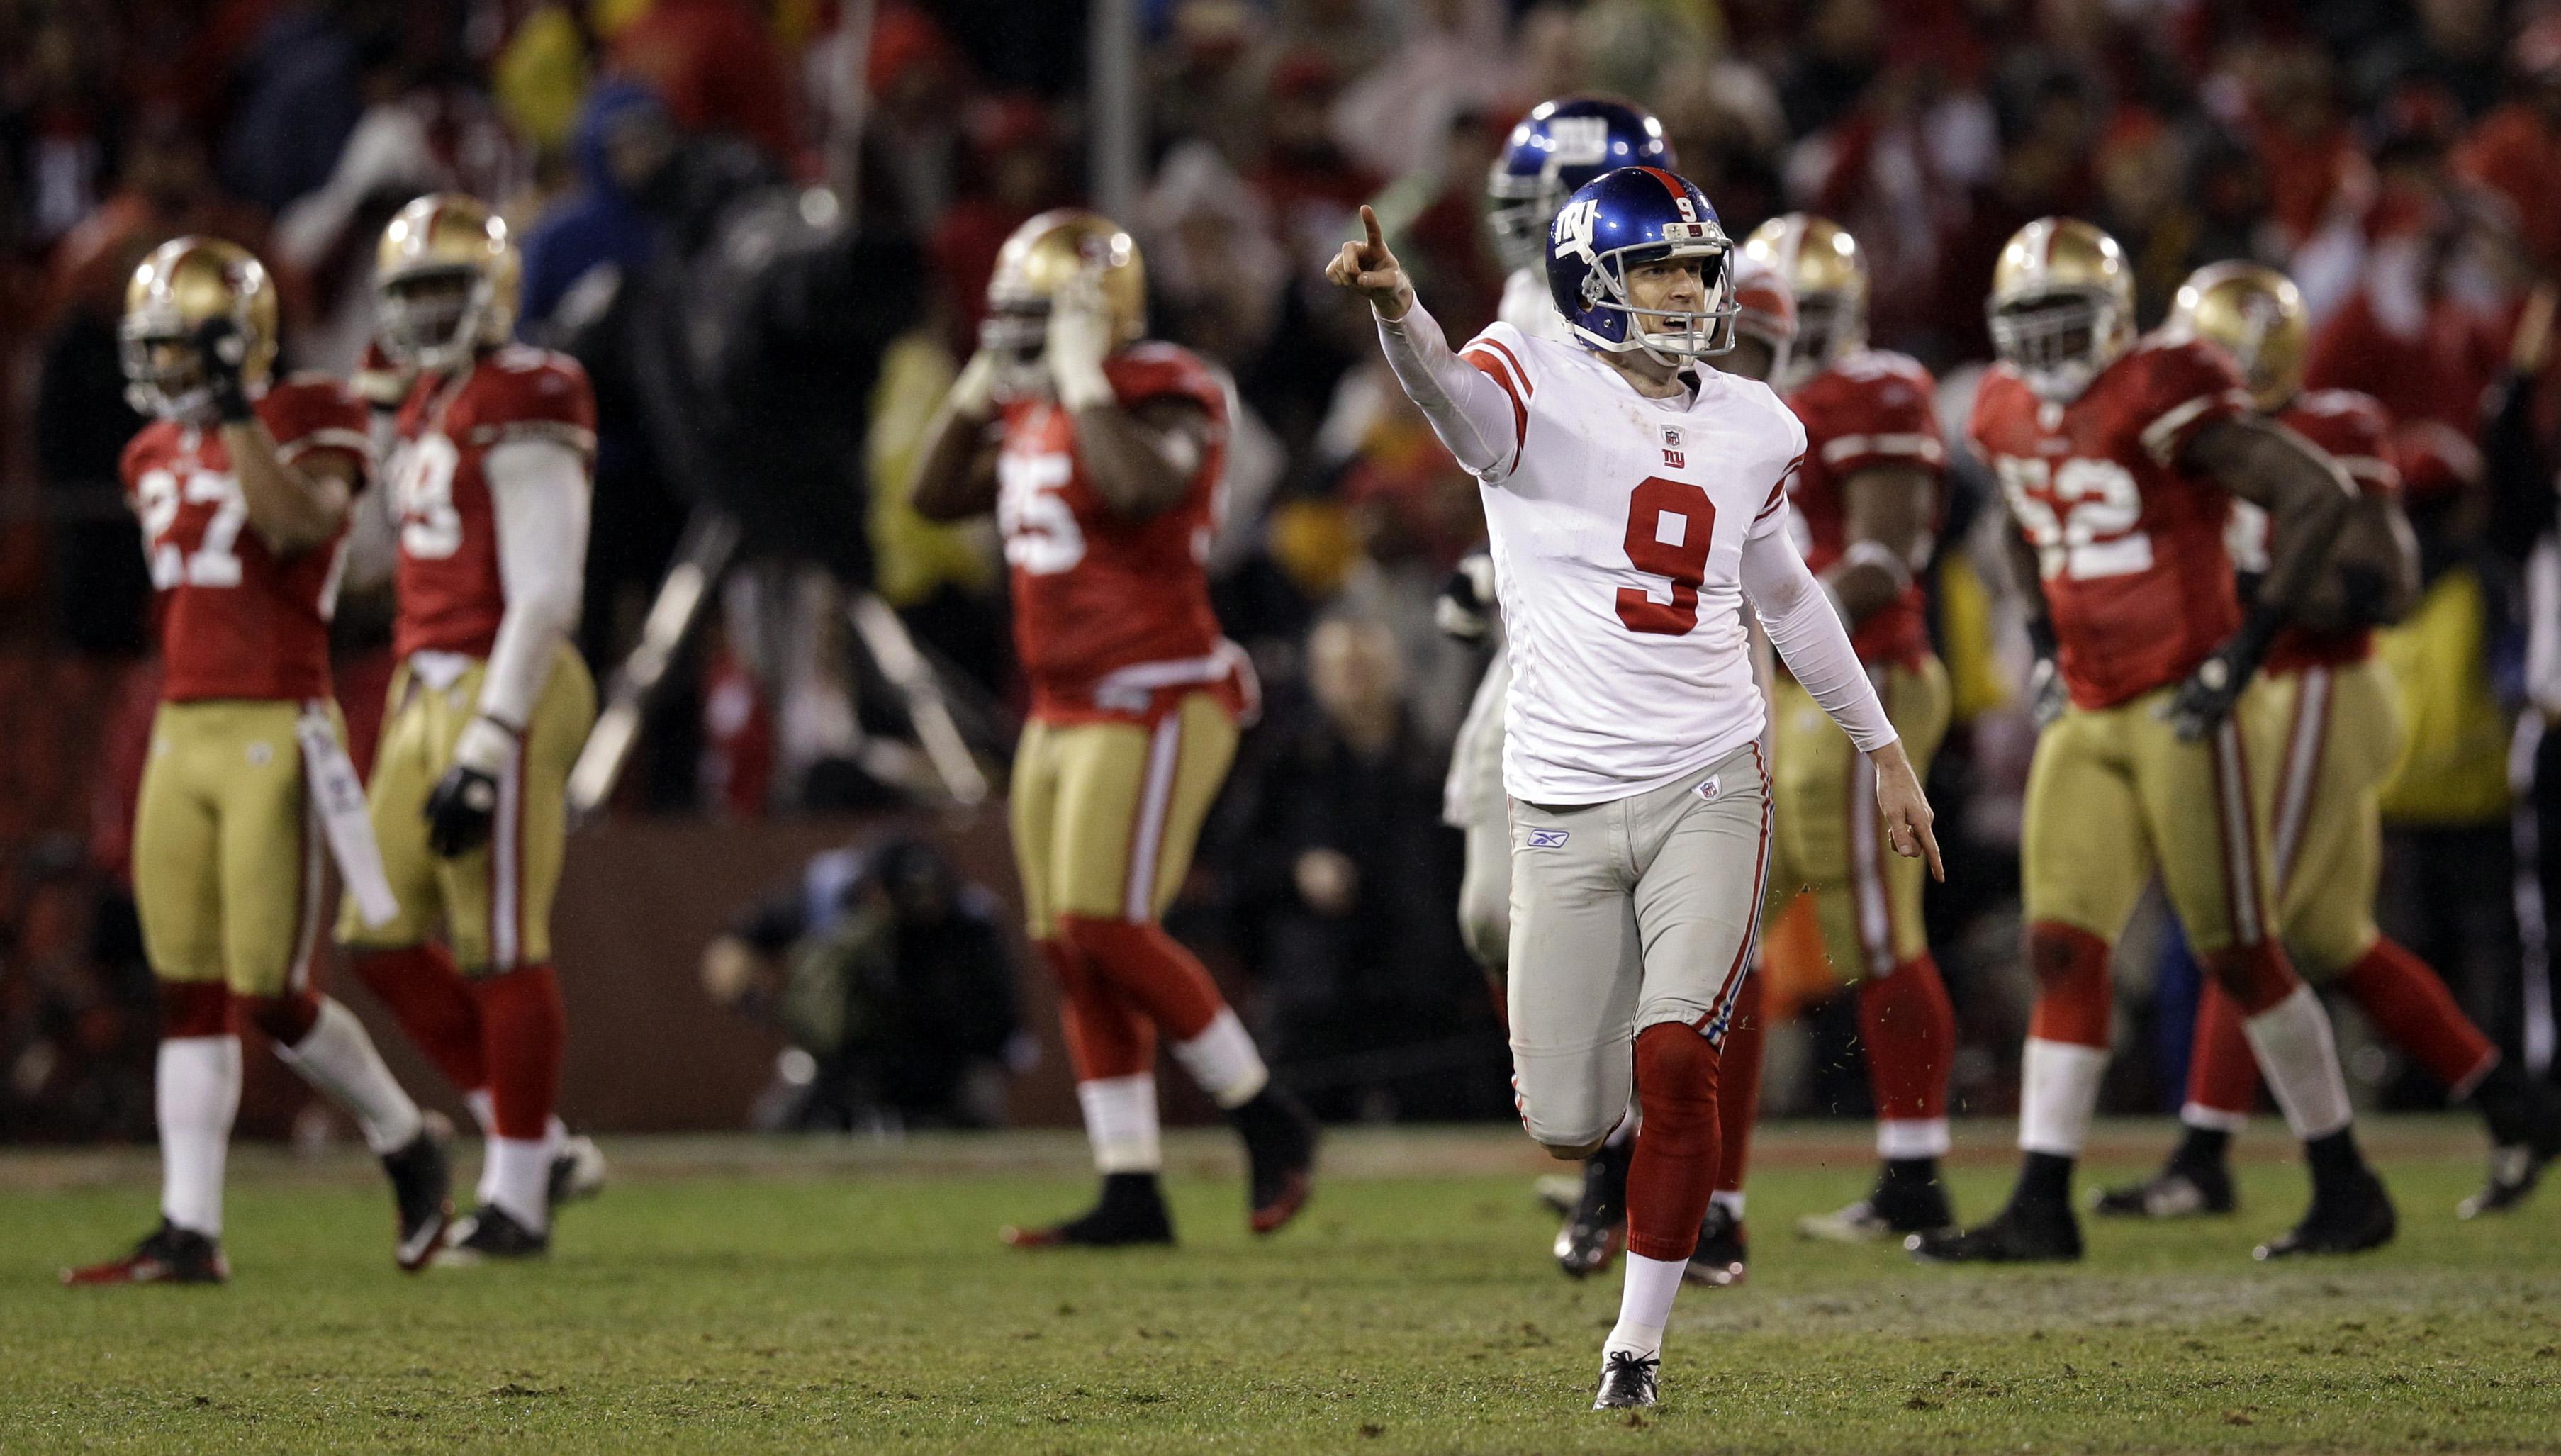 Tynes' OT boot vs. 49ers sends Giants into Super Bowl - Washington ...